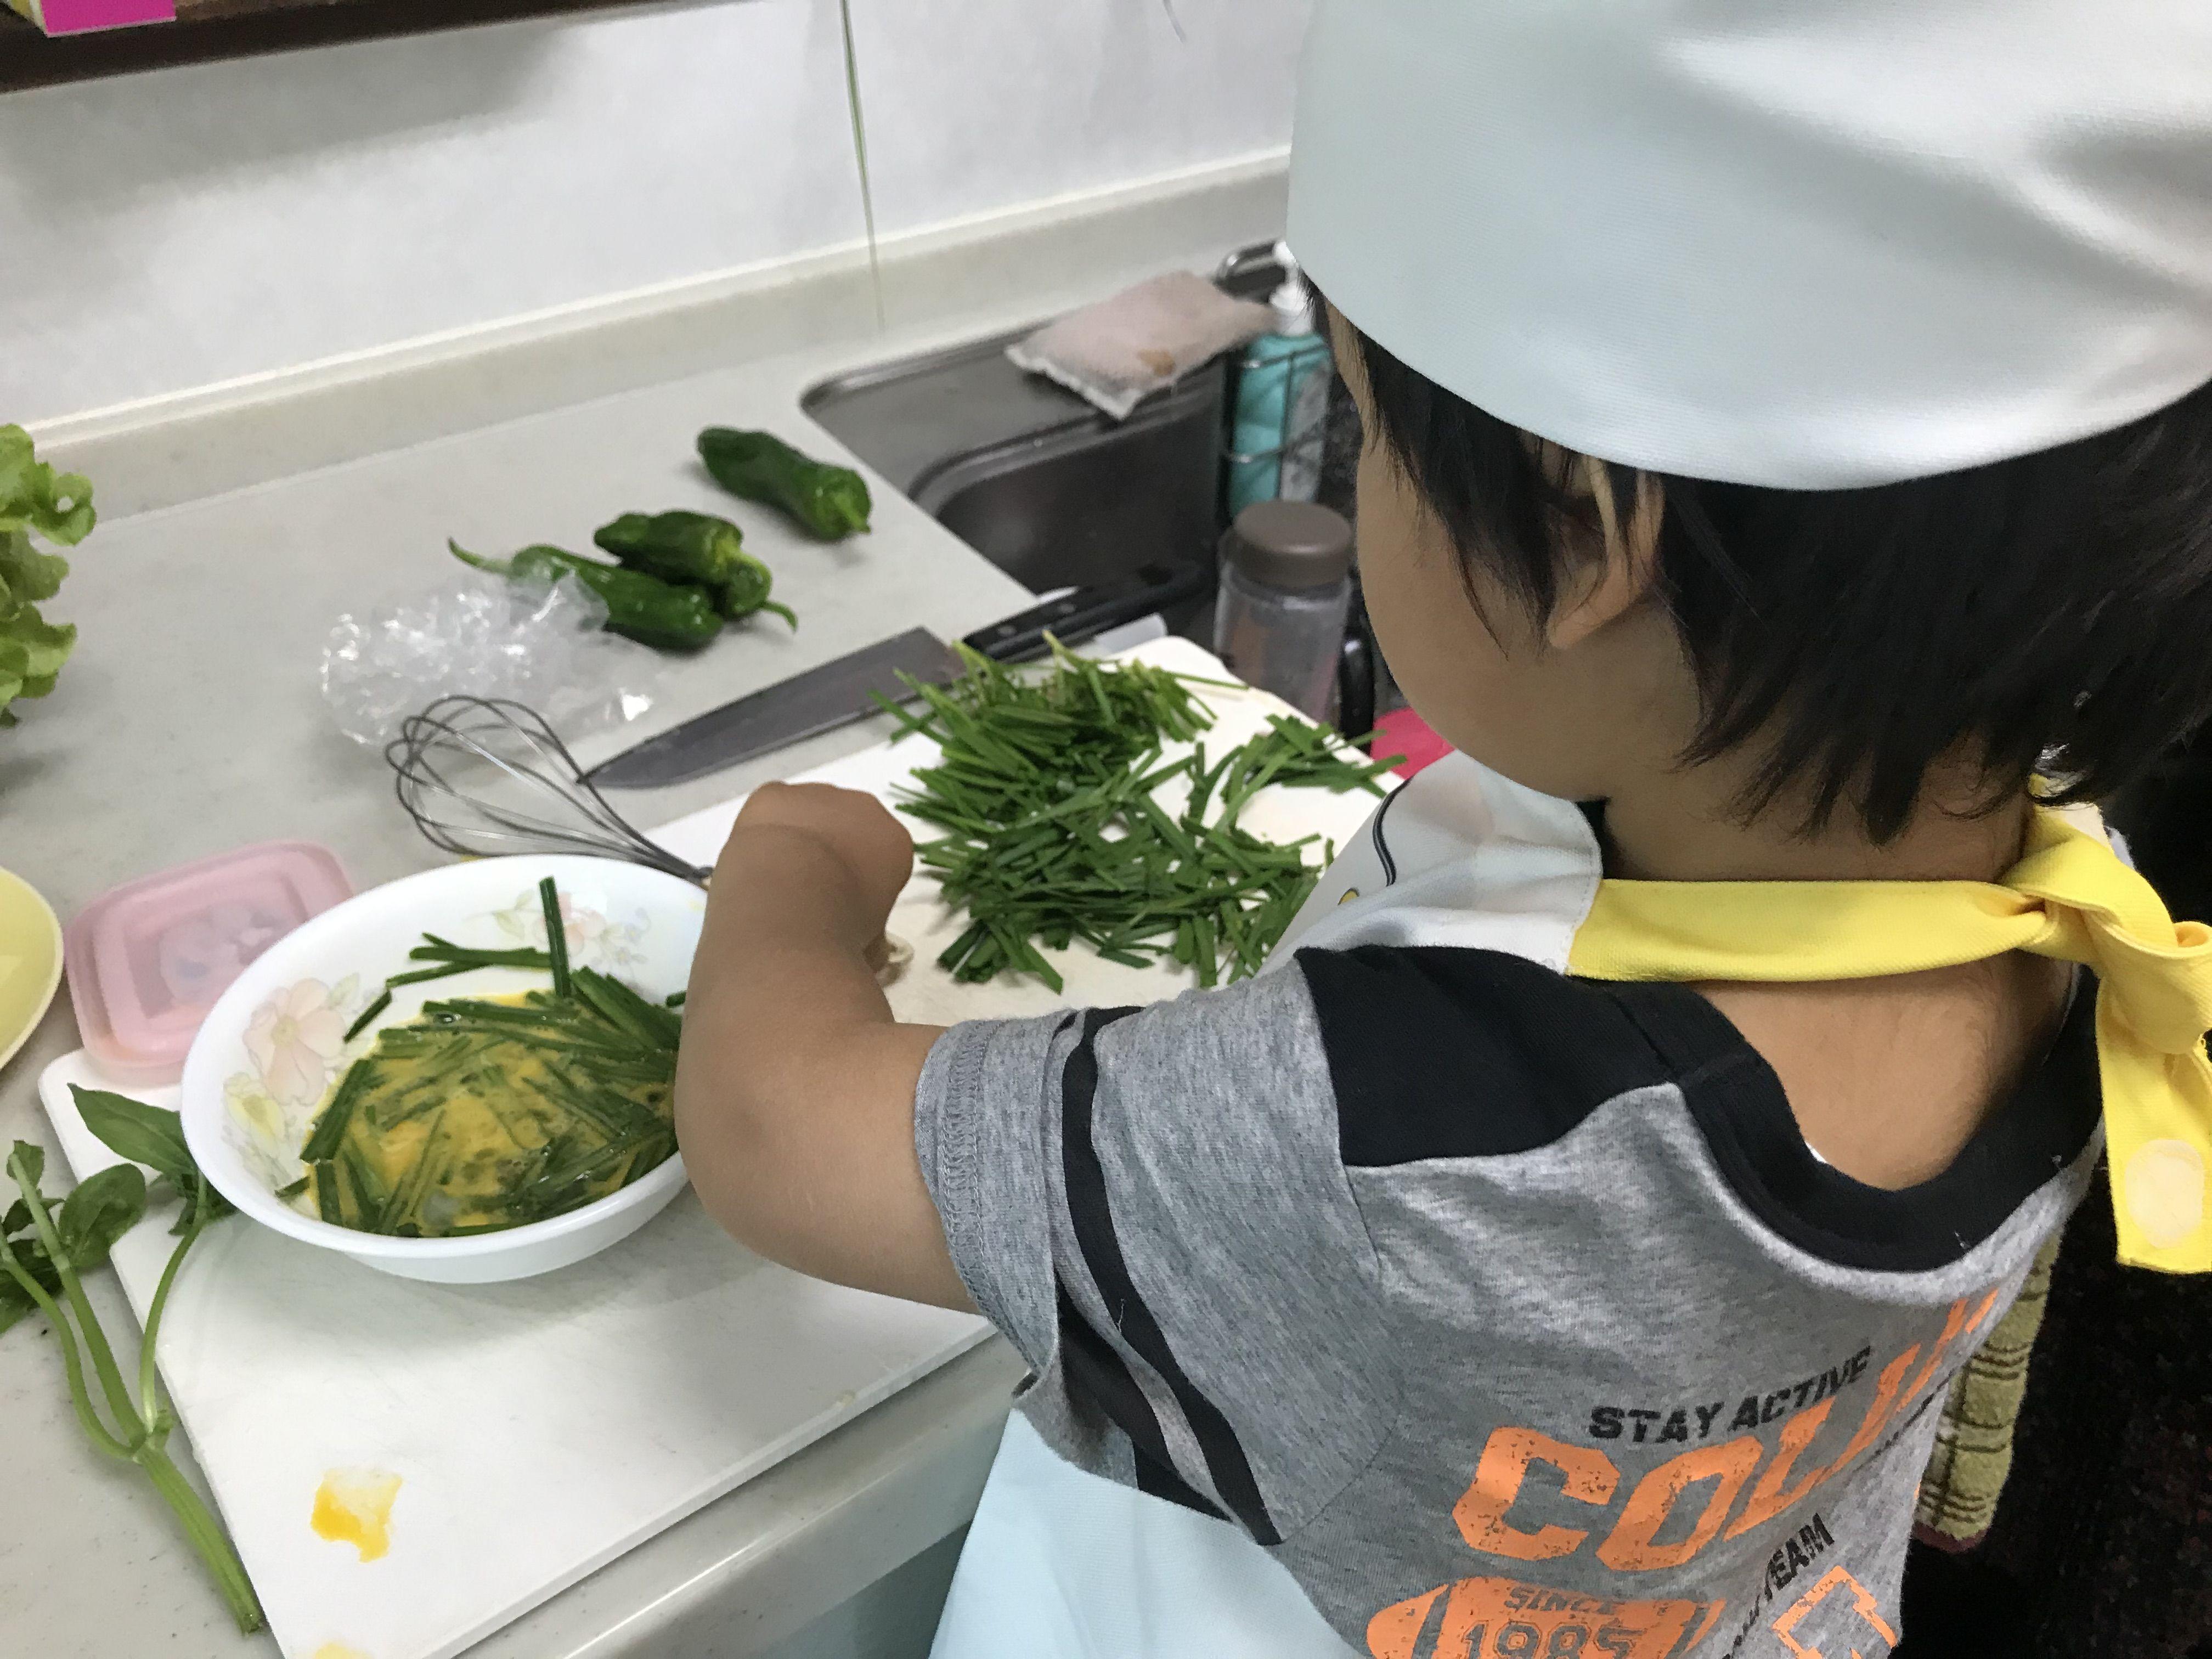 IKEAの子どもエプロンで楽しく料理♪